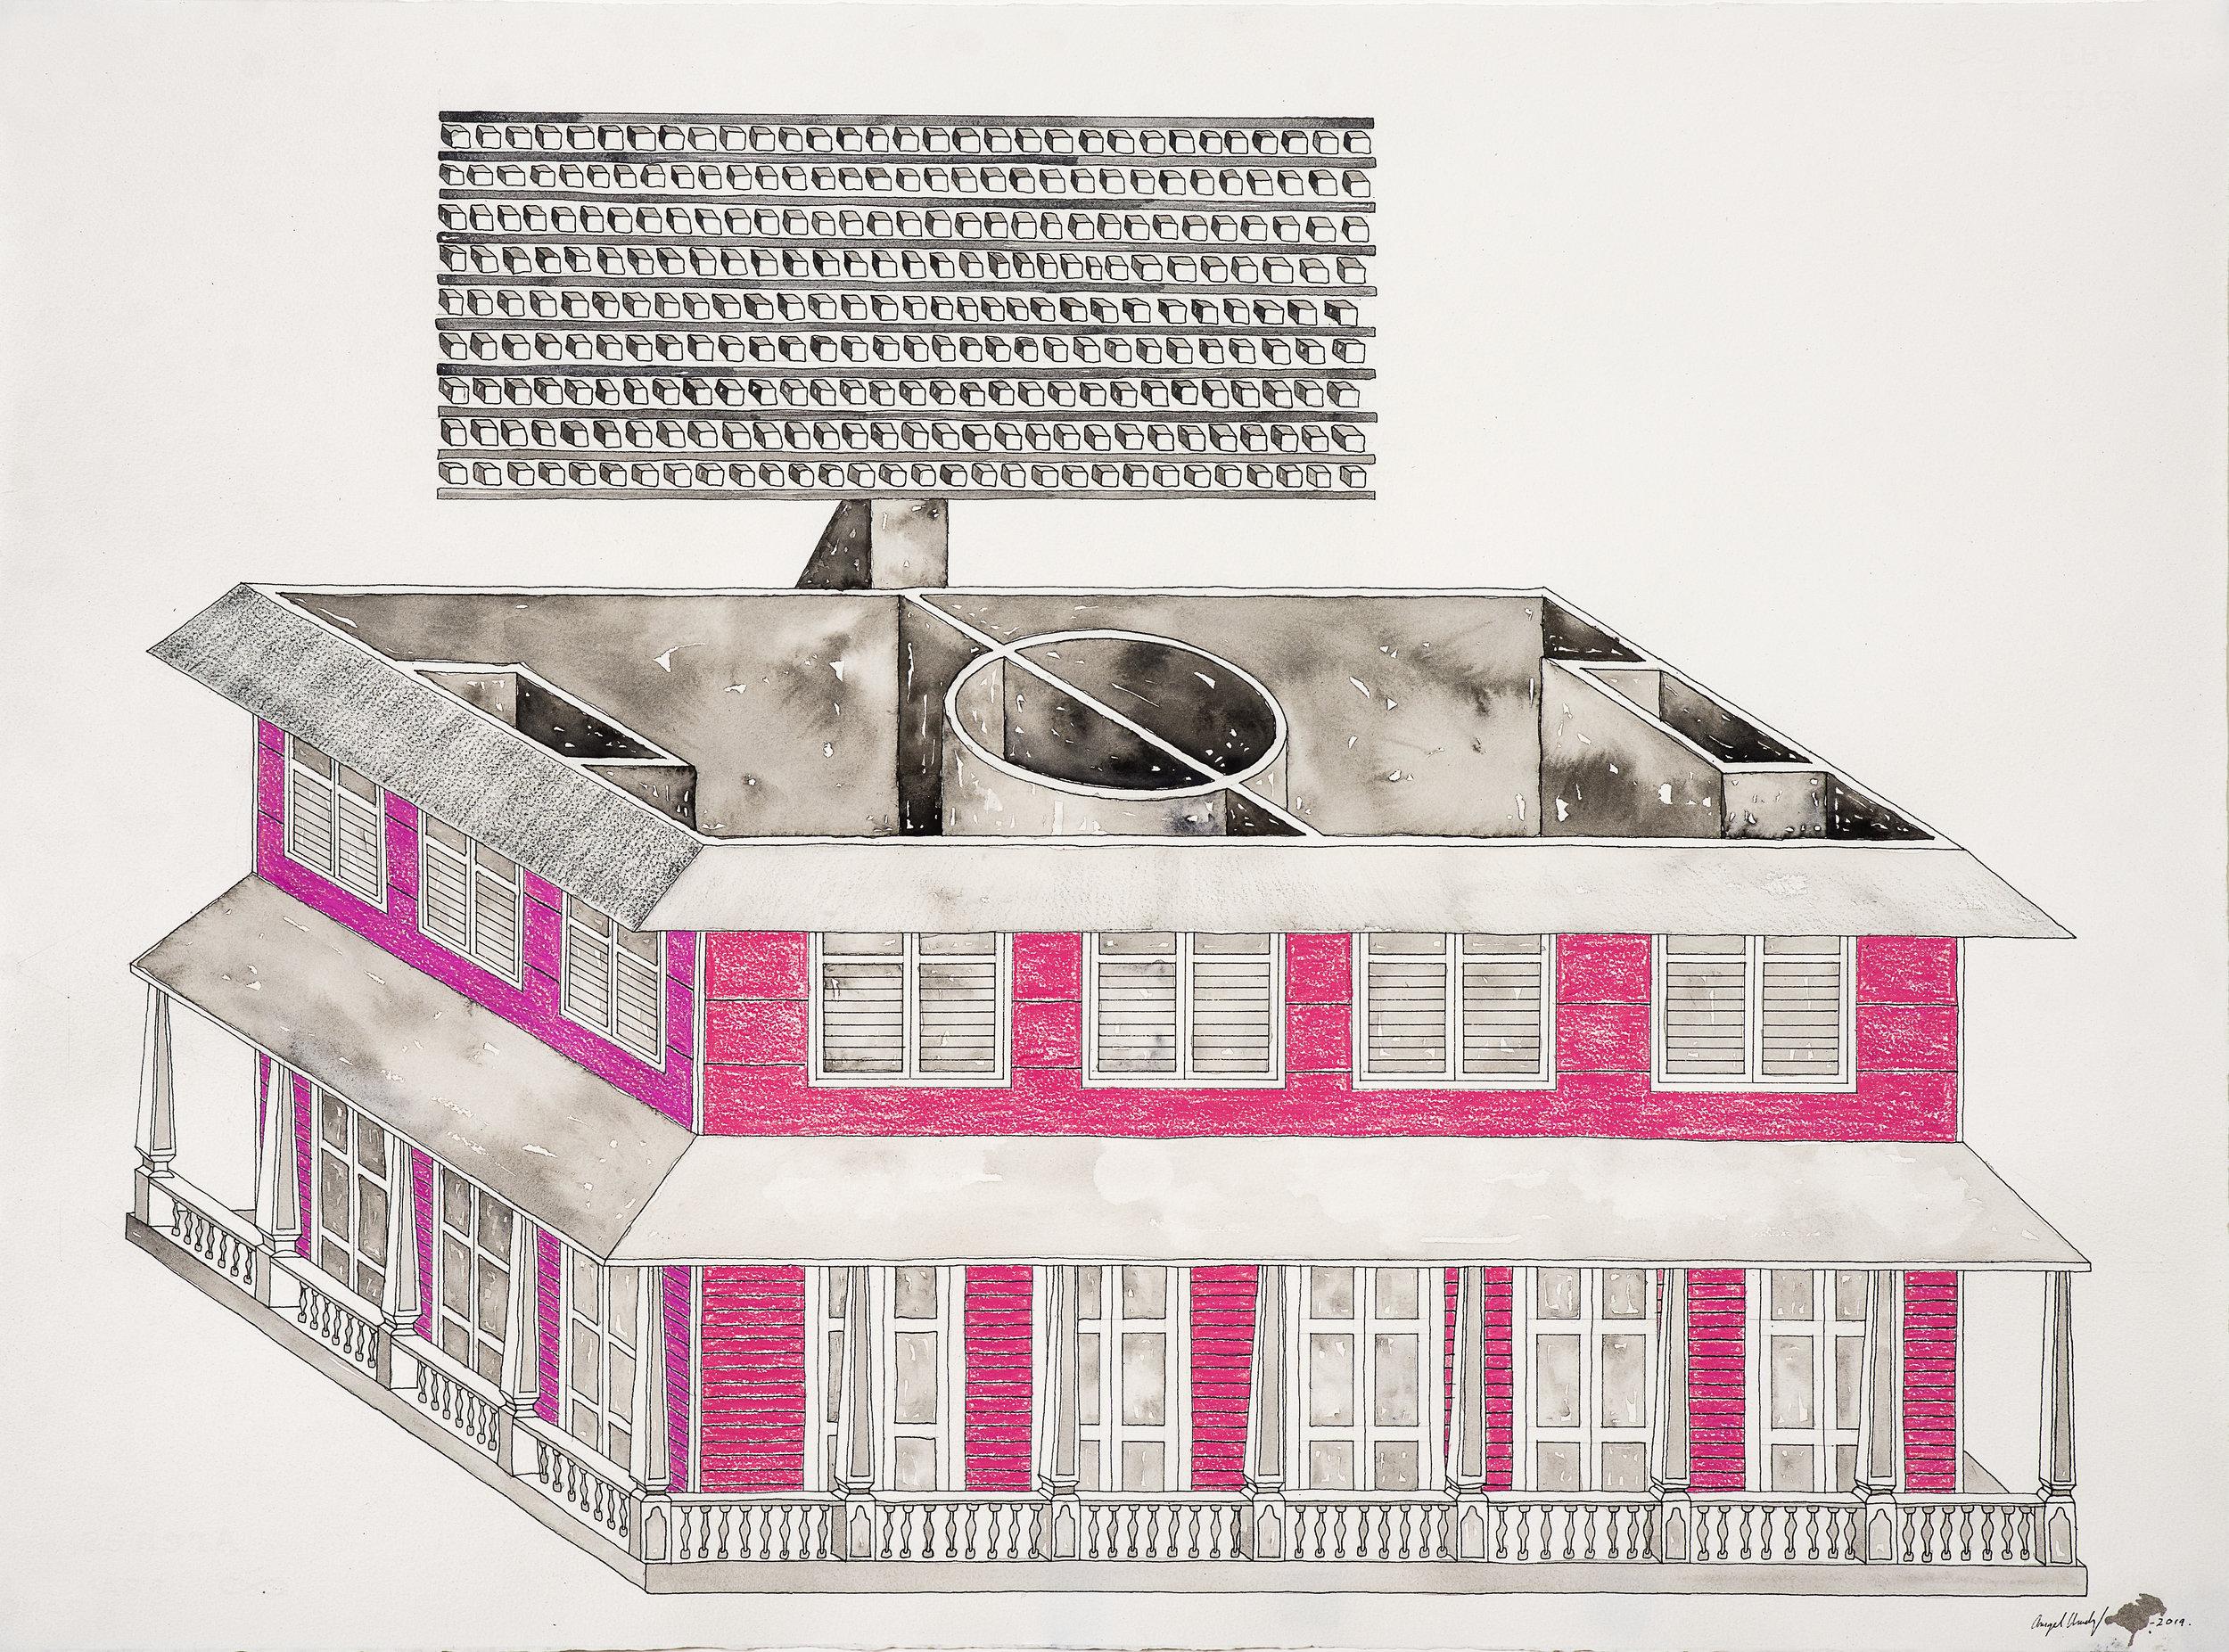 "S:T. Tinta, acuarela, lápiz de color prismacolor sobre papel Arches. 22 x 30.5"""".2019 .jpg"